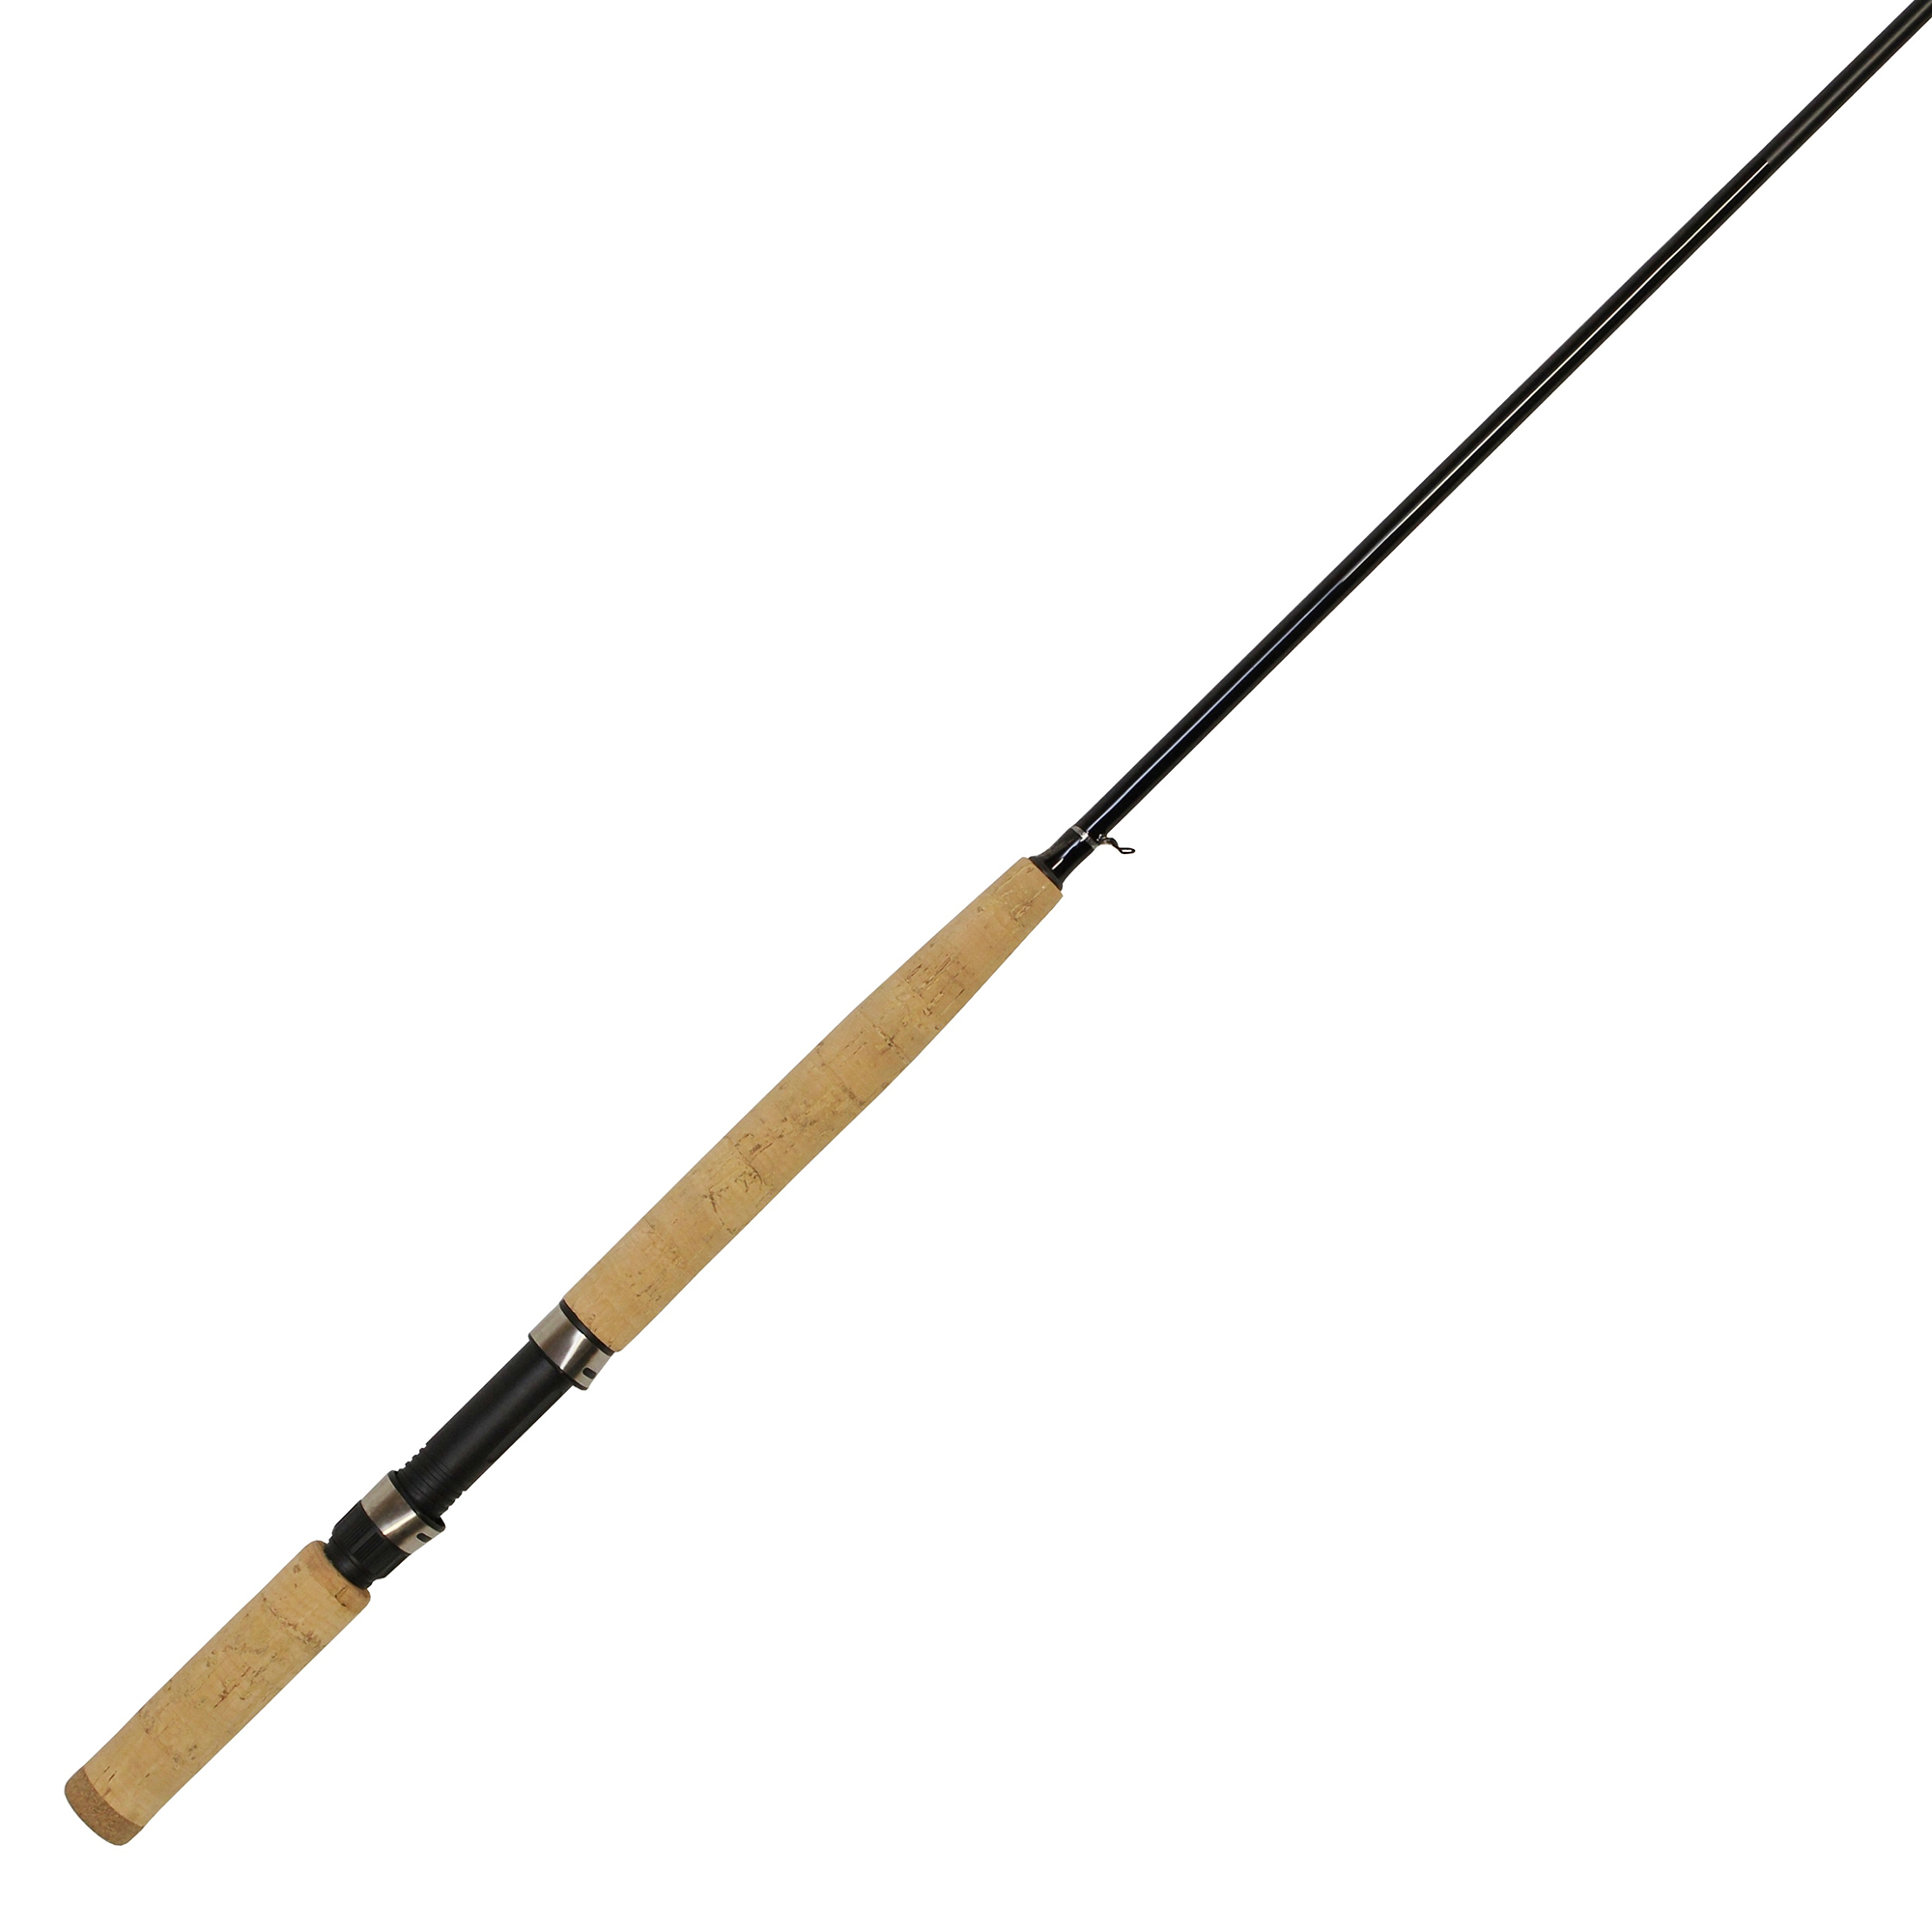 Riversider Michigan-Style Handle Steelhead Noodle Rod